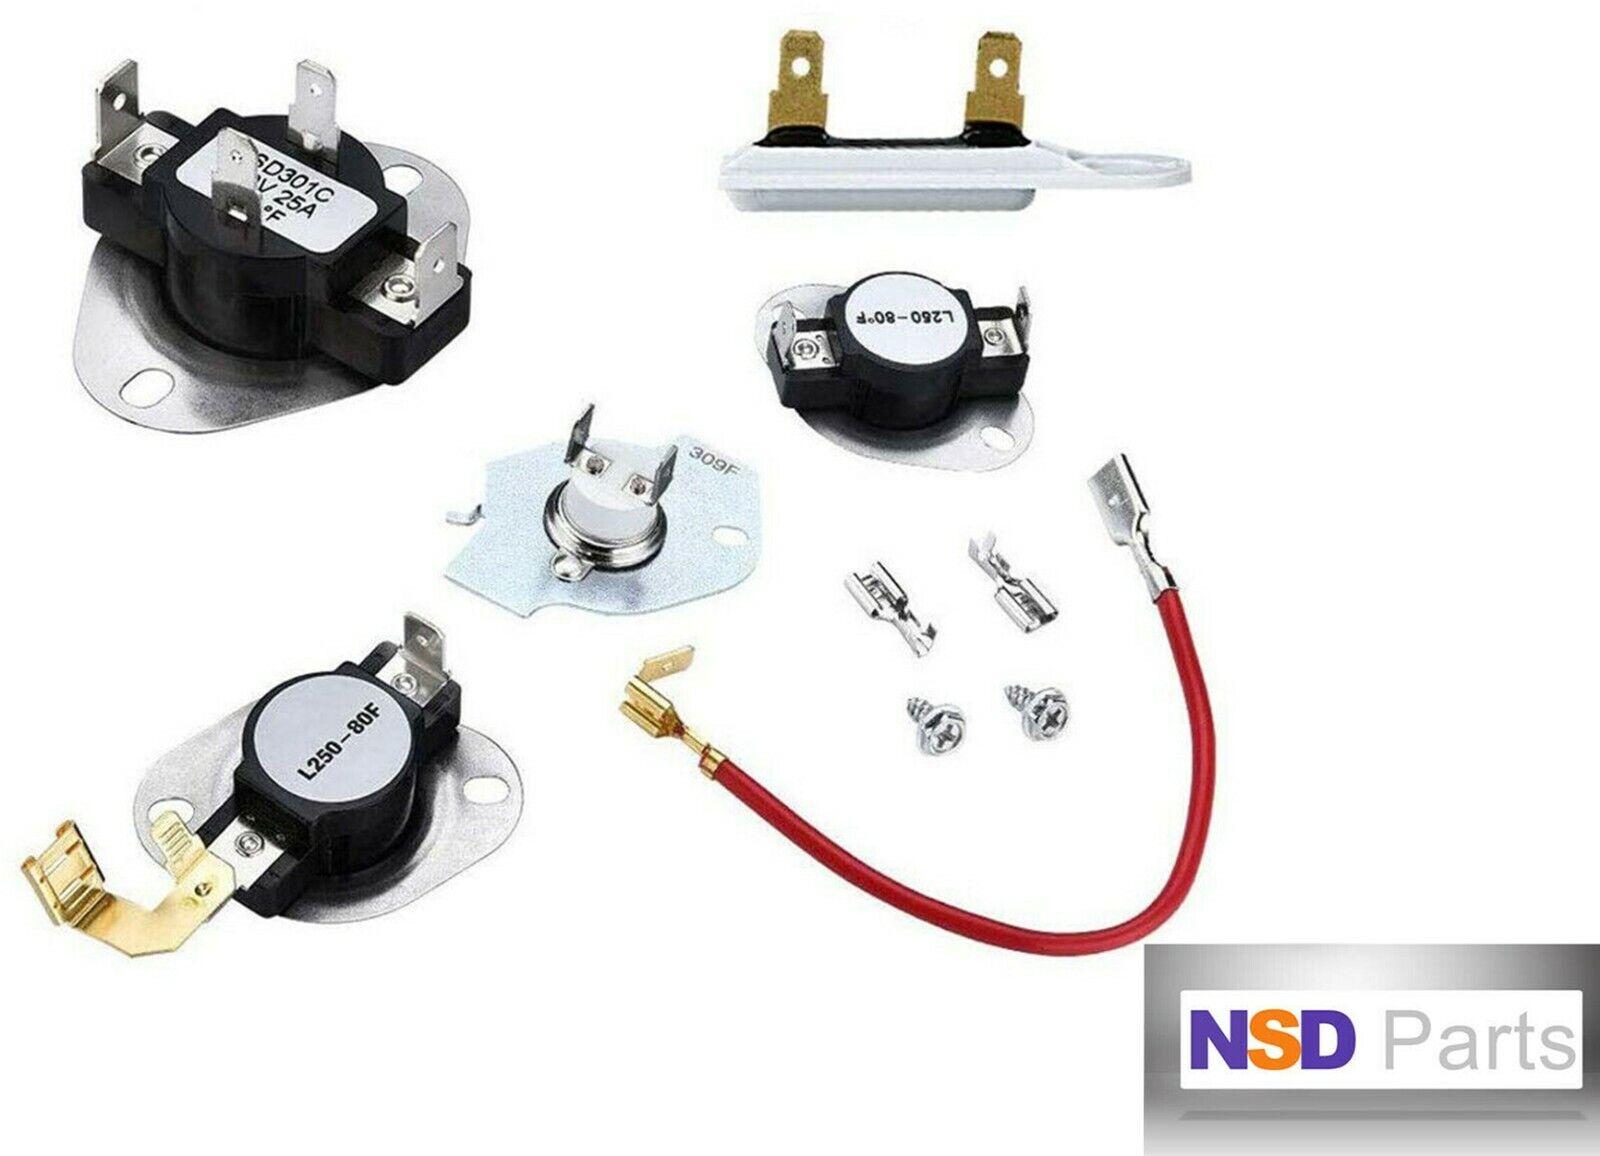 3387134, 3977767, 279816, 3392519 Dryer thermostat fuse kit